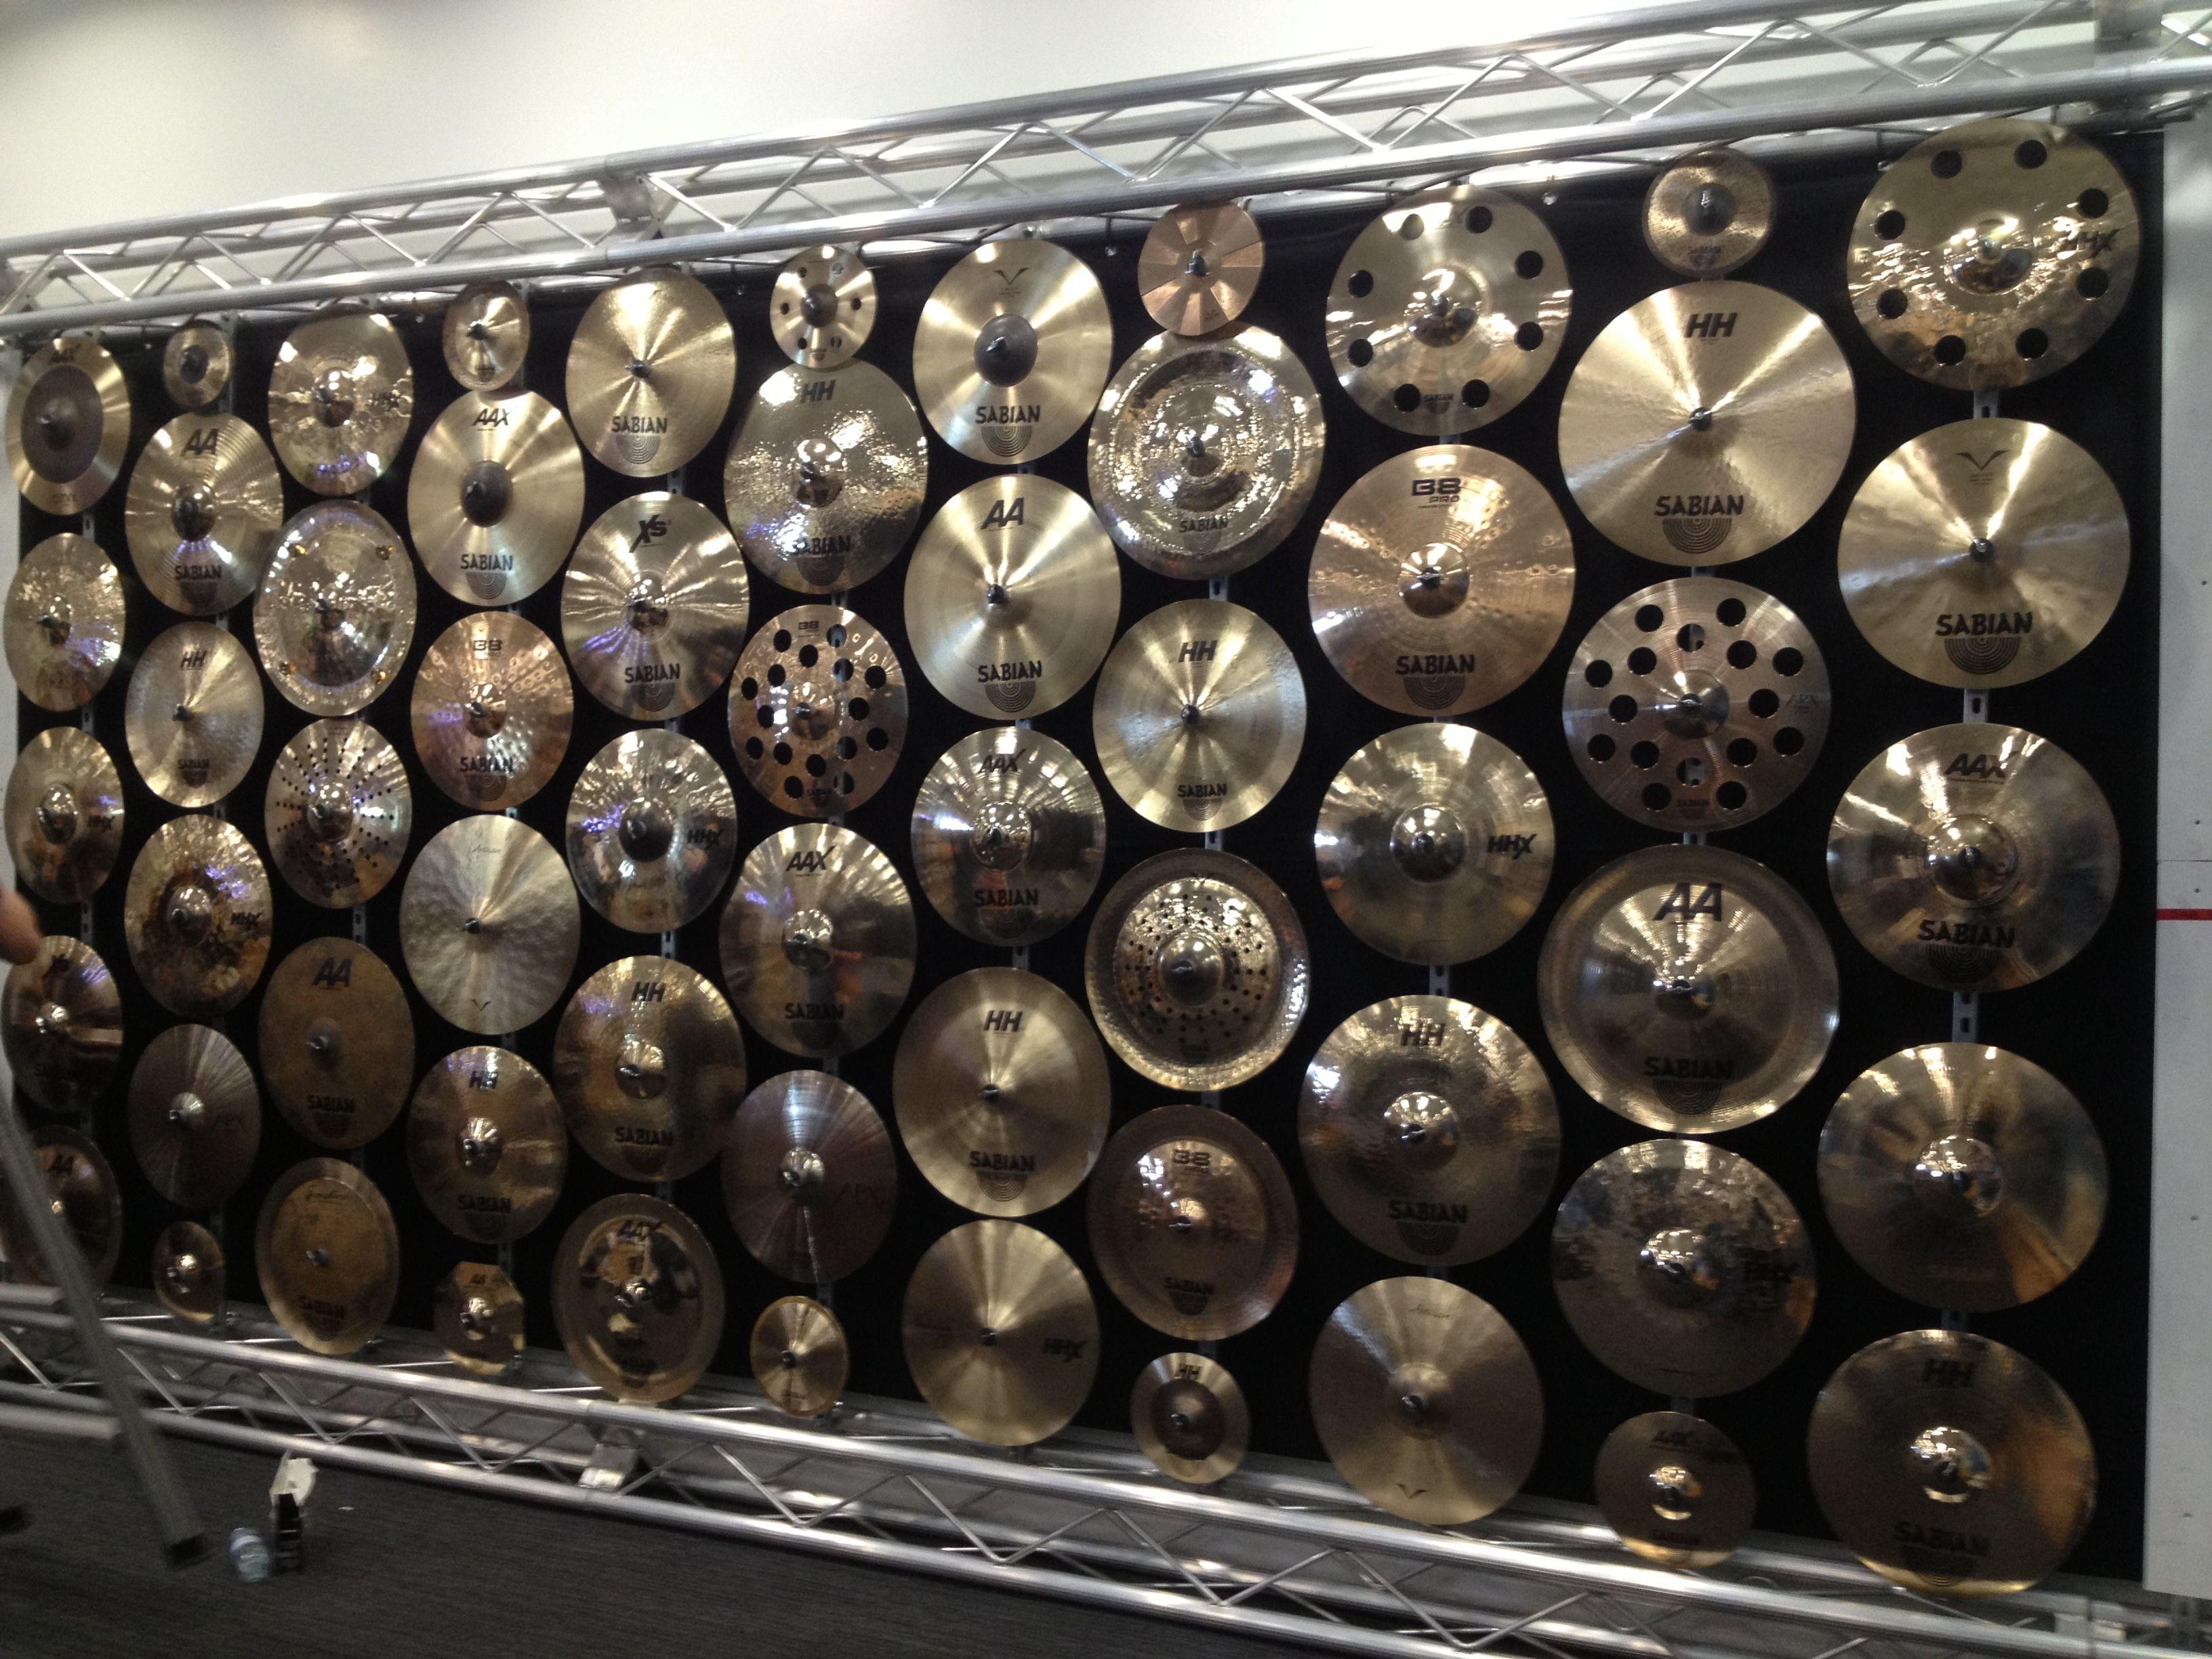 Wall Of Cymbals Zildjian Cymbals Cymbals Drum Kits